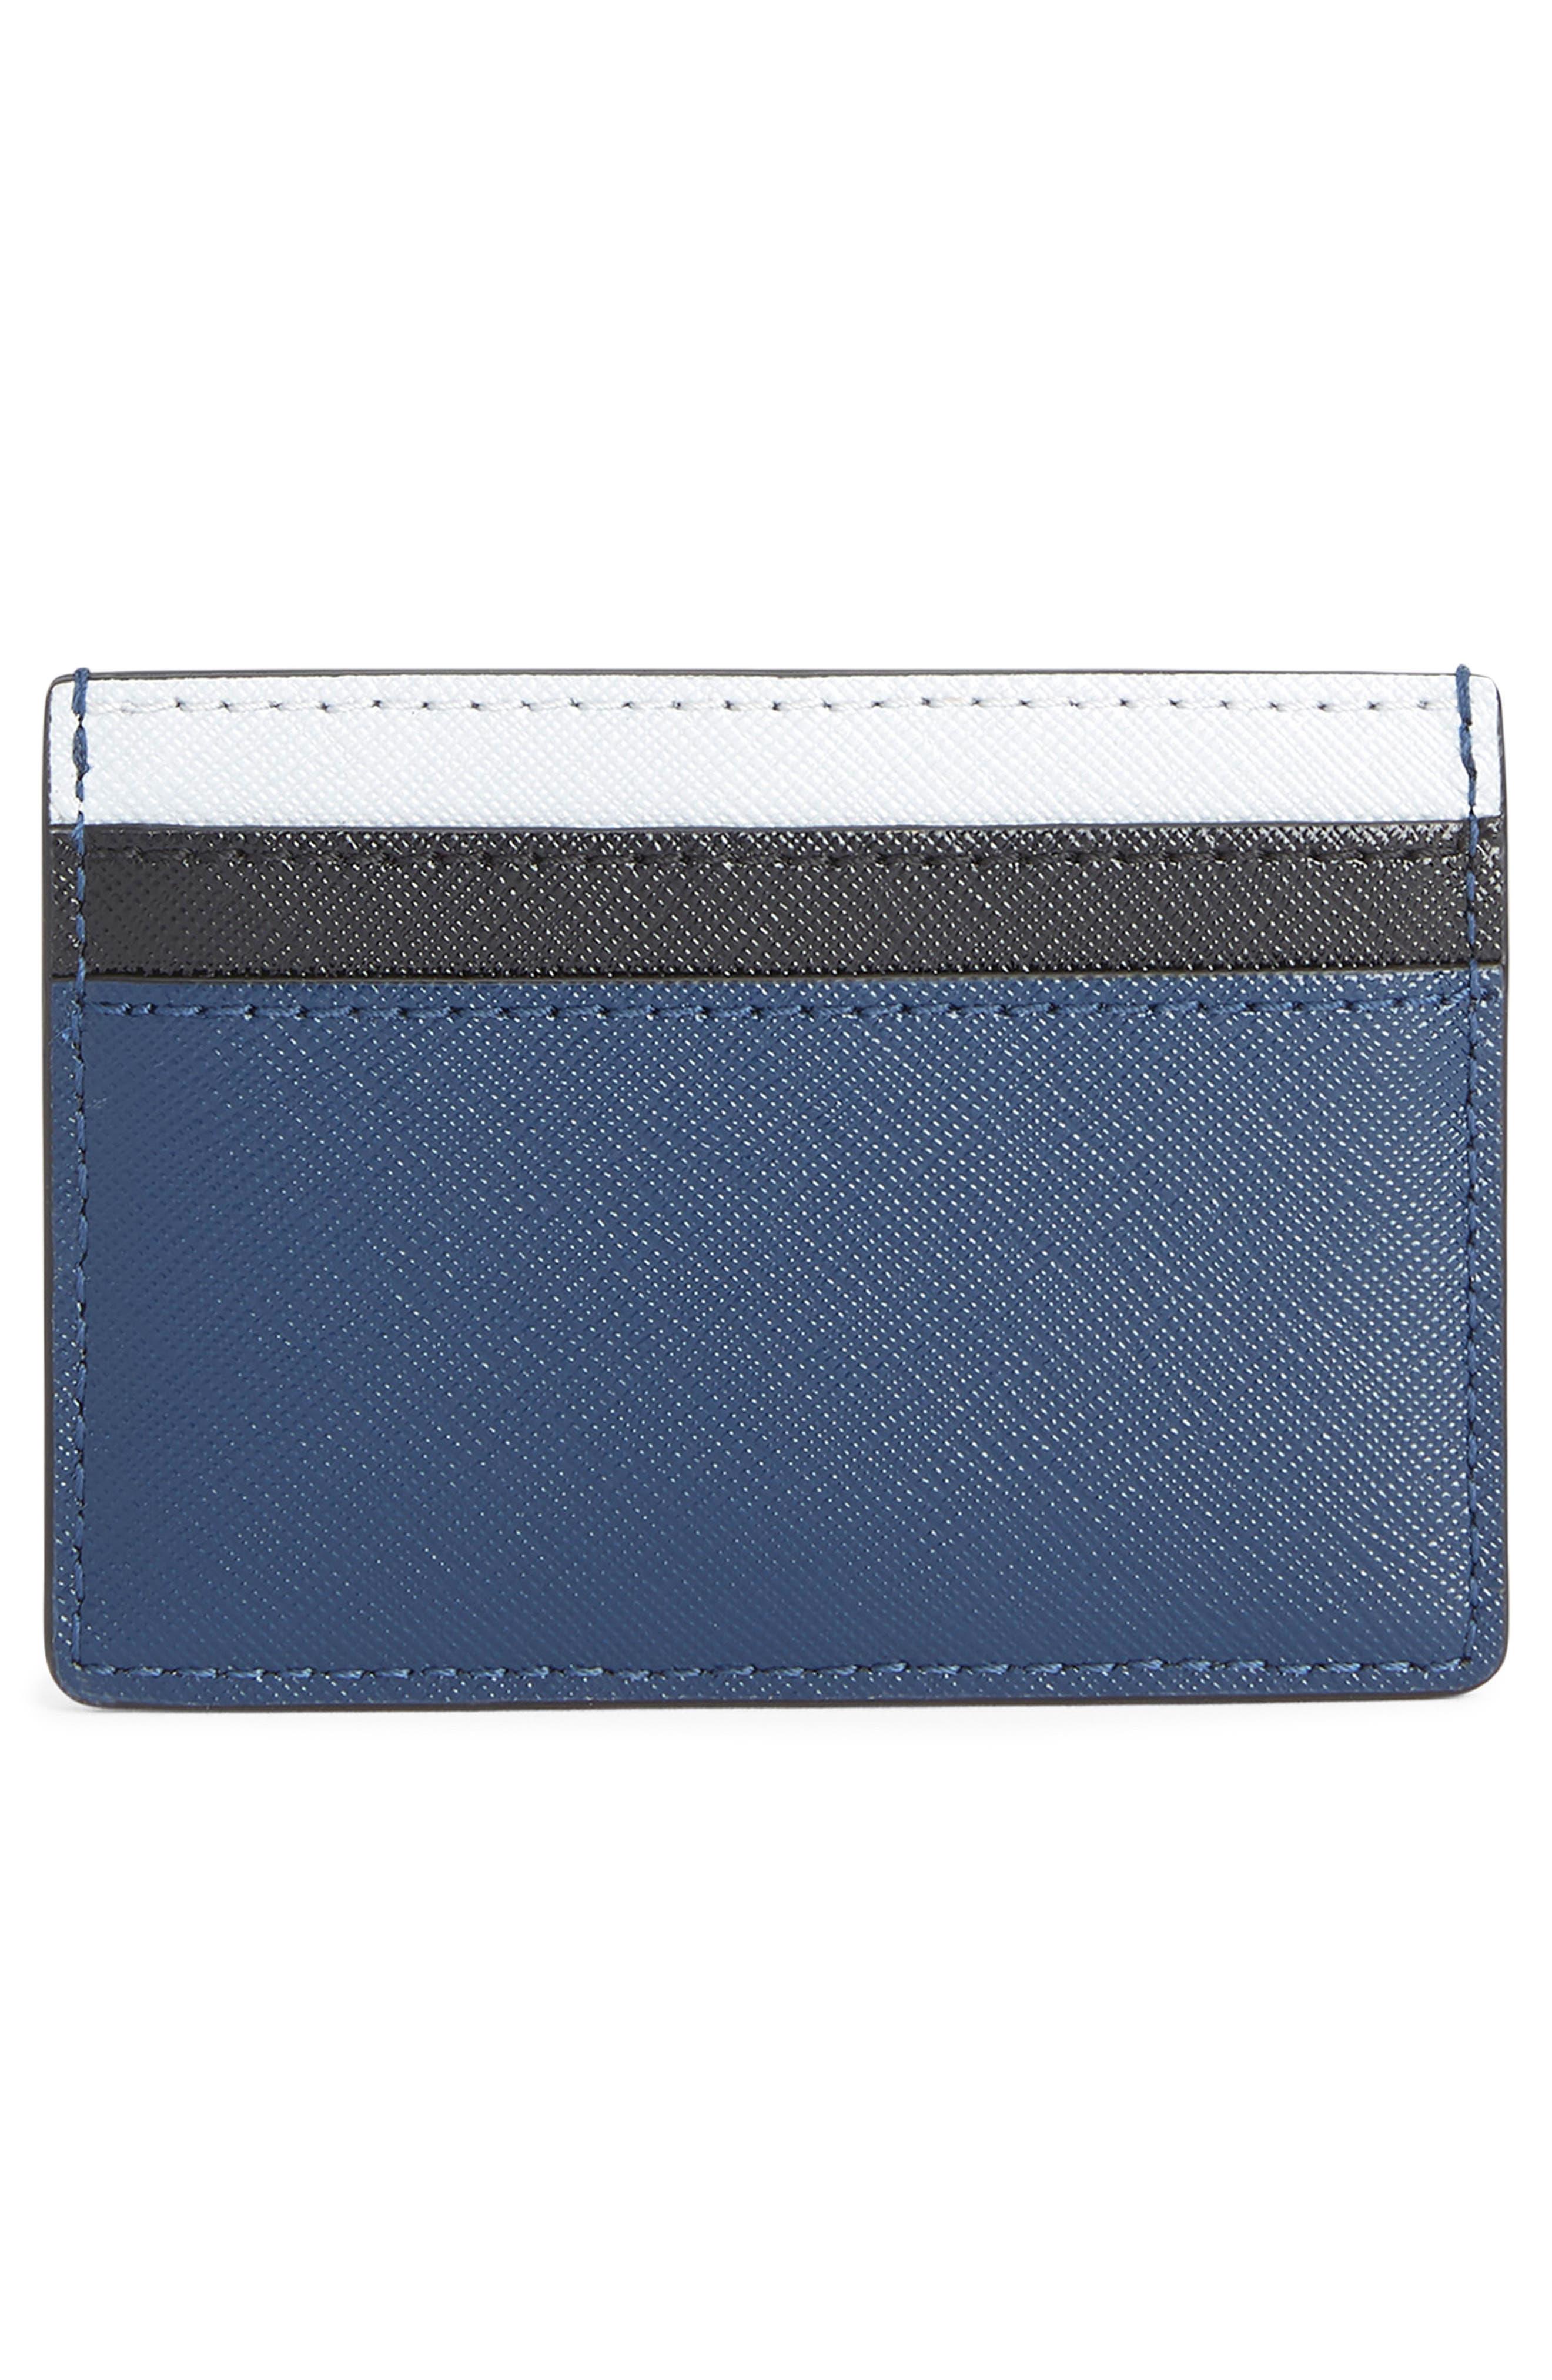 Snapshot Saffiano Leather Card Case,                             Alternate thumbnail 2, color,                             BLUE SEA MULTI